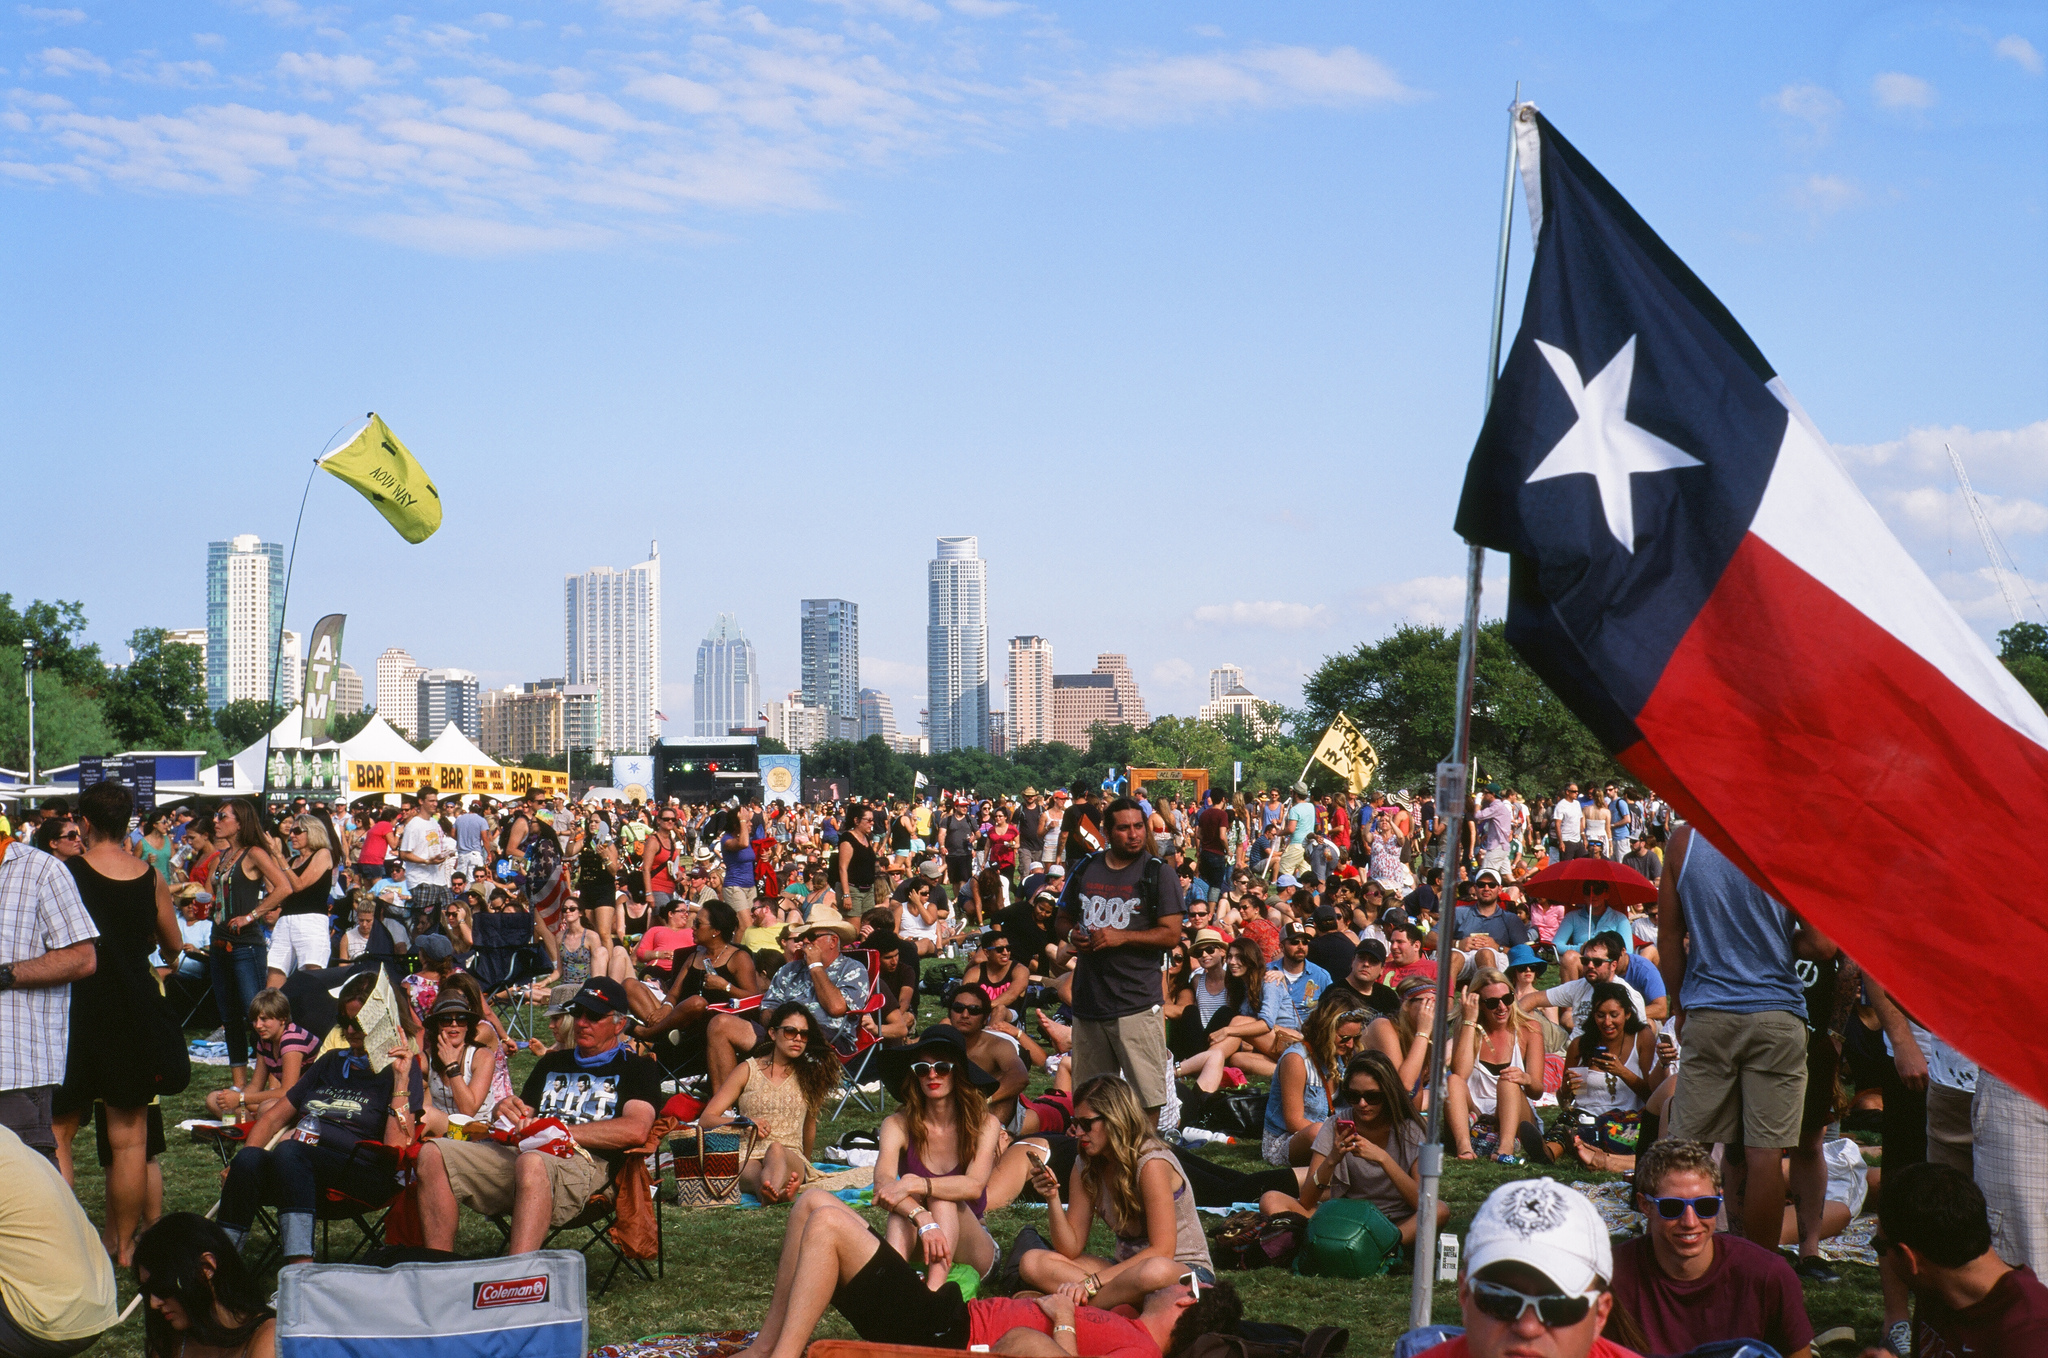 Austin City Limits © Lars Plougmann/Flickr